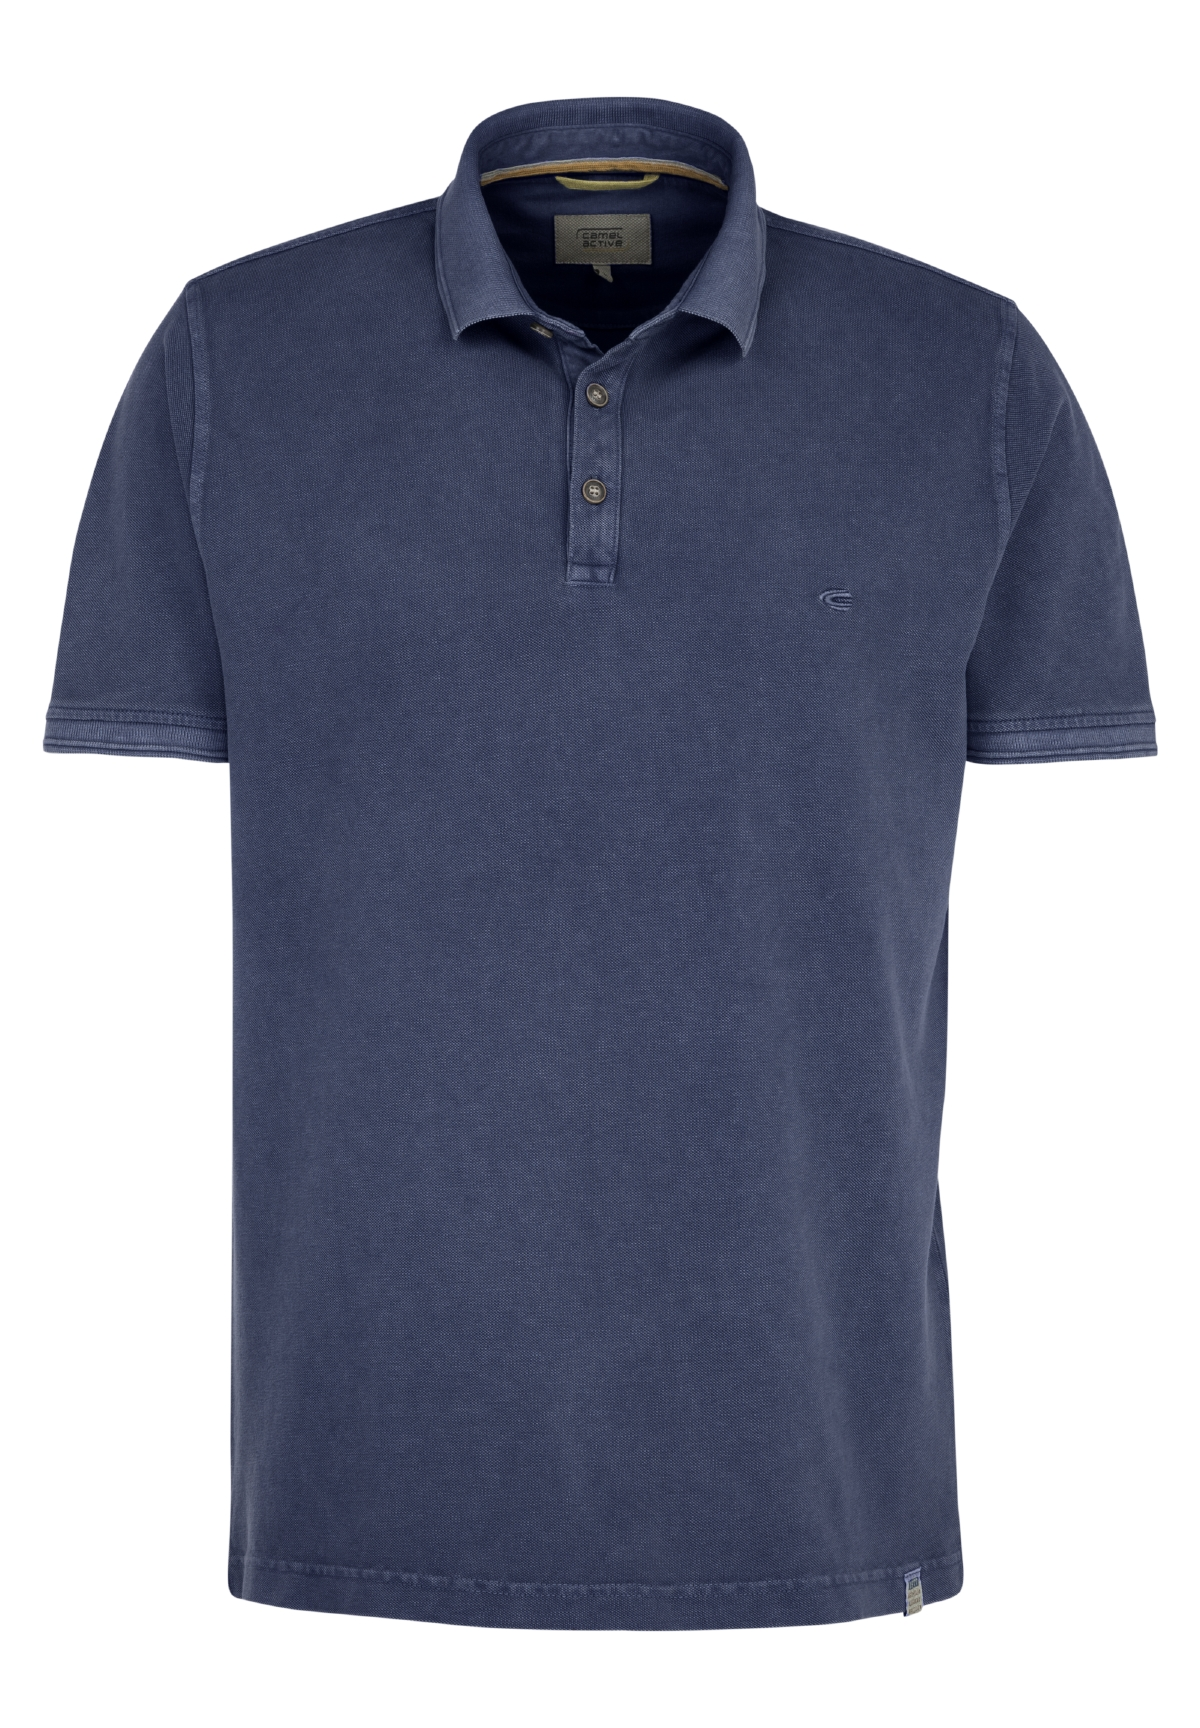 Camel-Active-Herren-Shirt-Poloshirt-Pique-Regular-Fit-NEU Indexbild 27